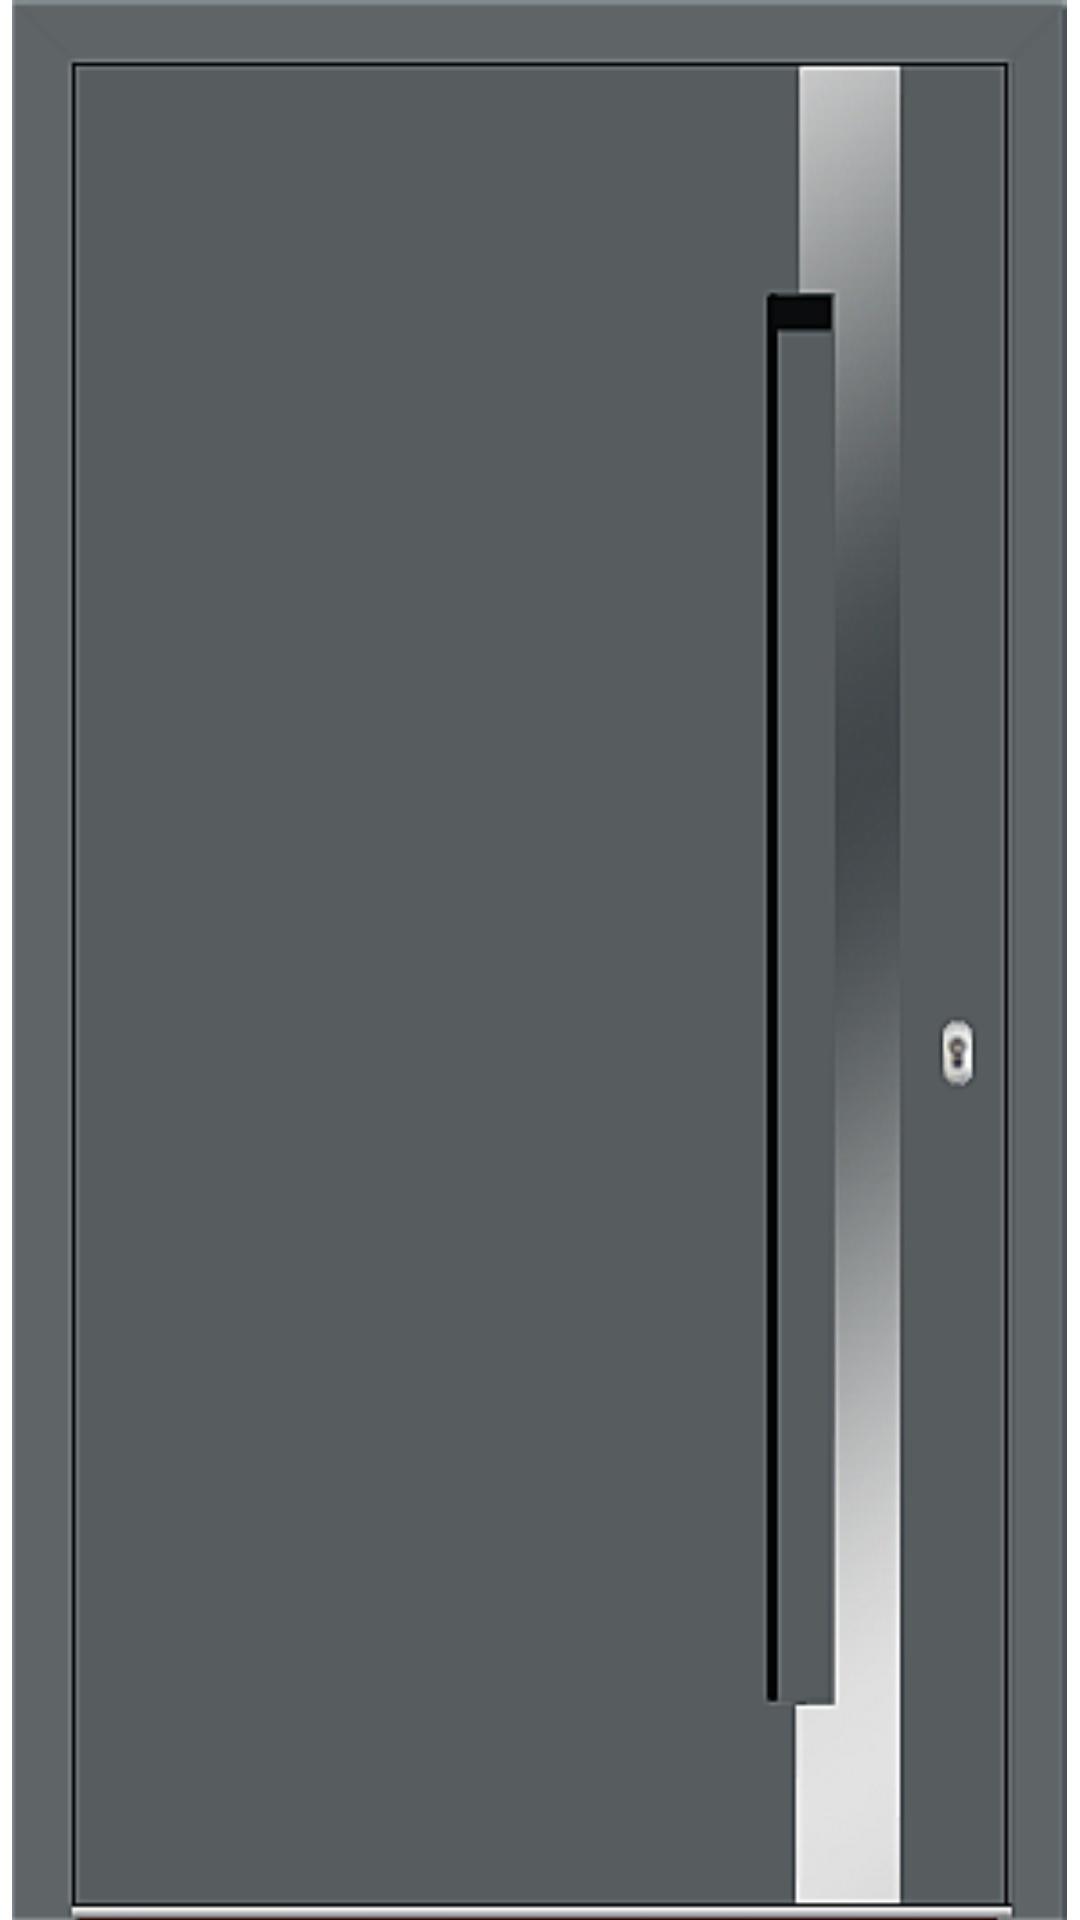 Aluminium Haustür Modell 6974-40 basaltgrau